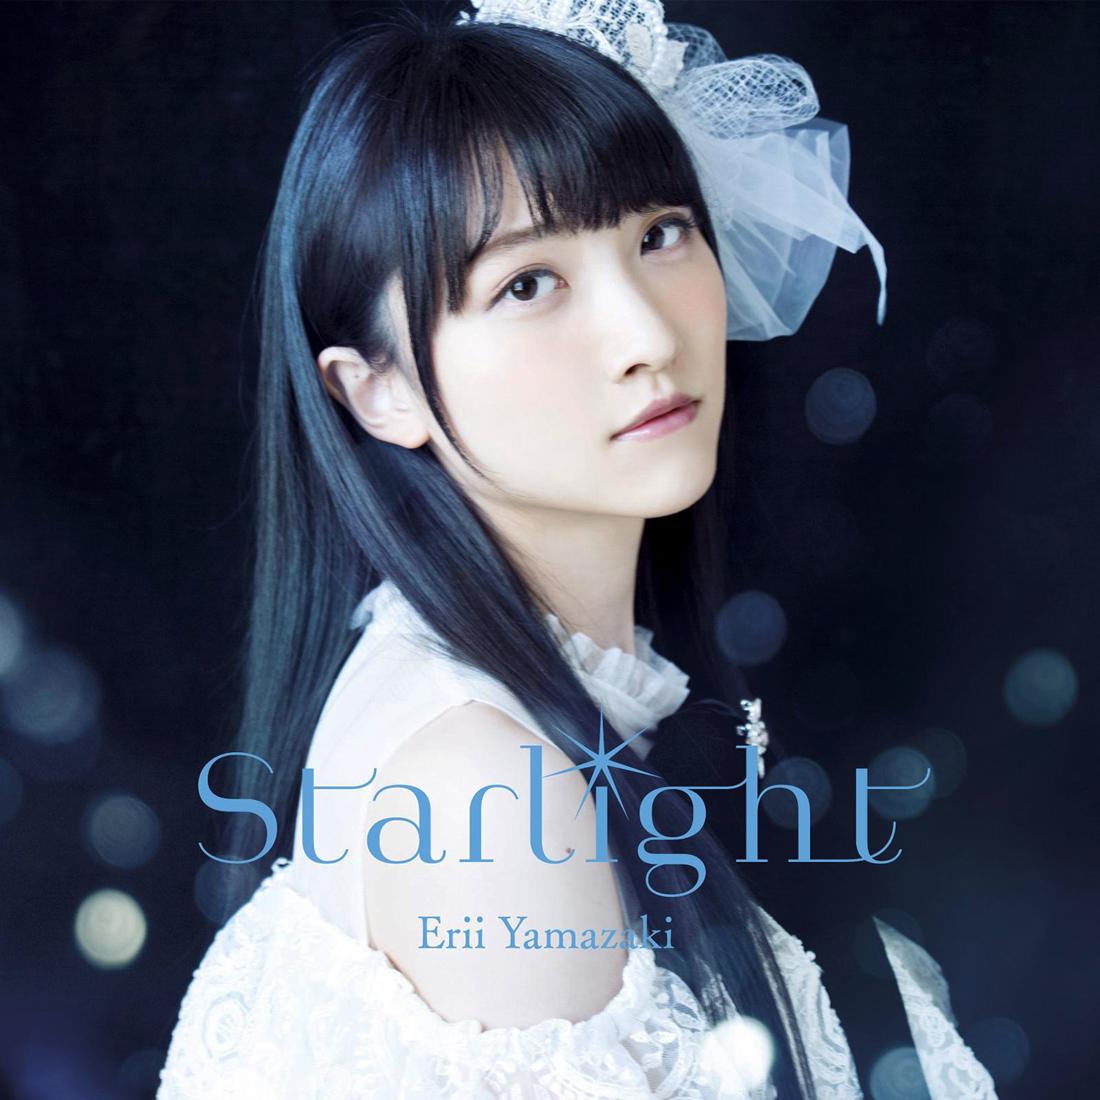 20181026.0231.2 Erii Yamazaki - Starlight (FLAC) cover.jpg